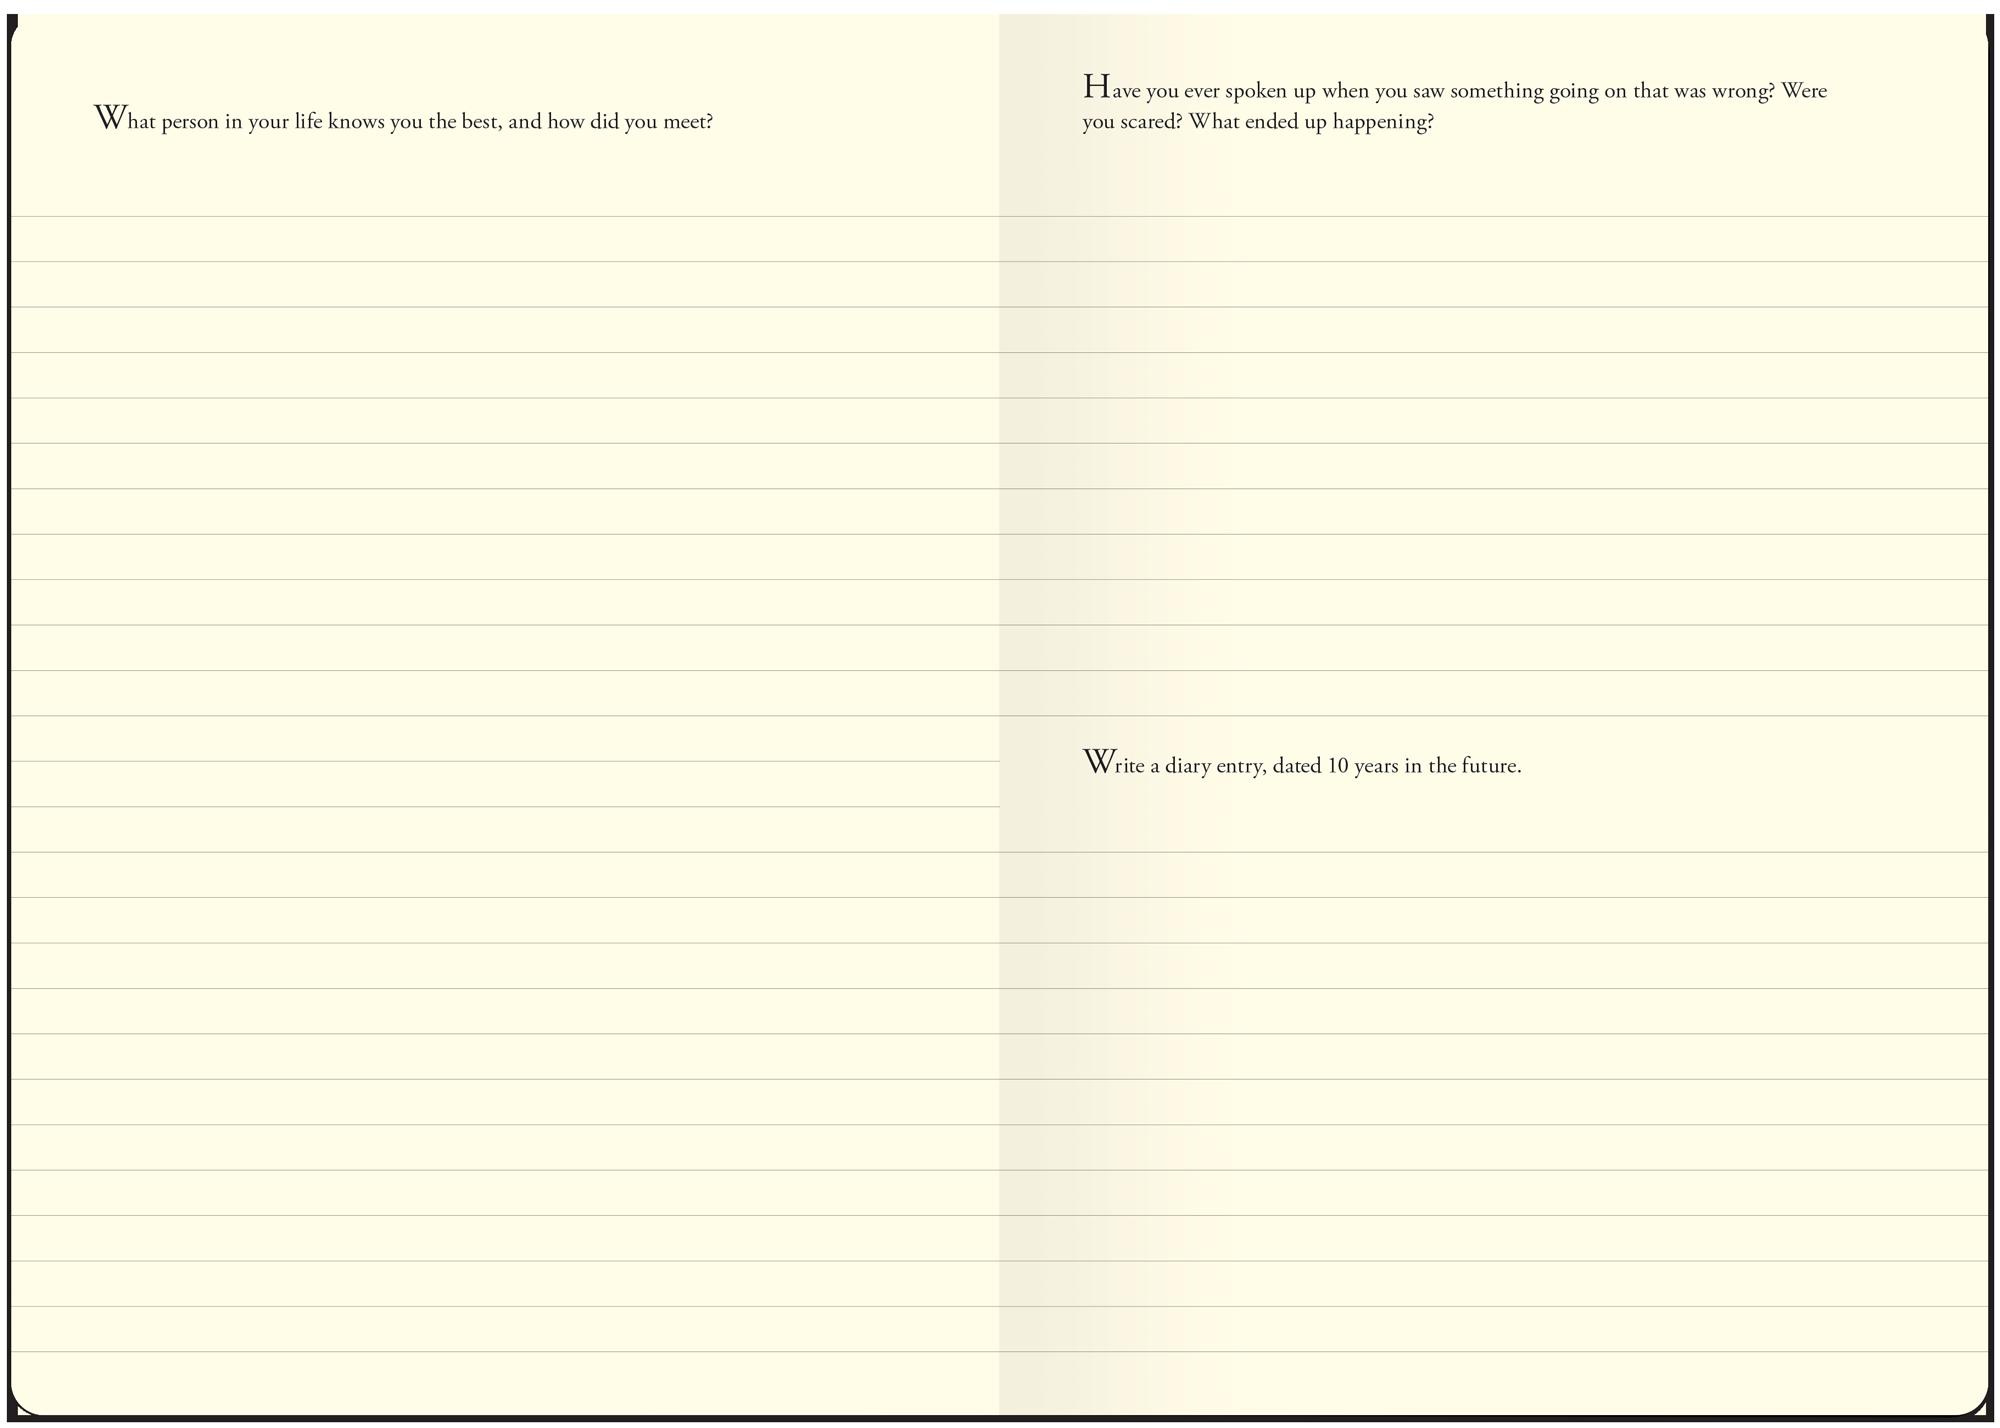 Creative-Writing-Inside-Page-Spread3